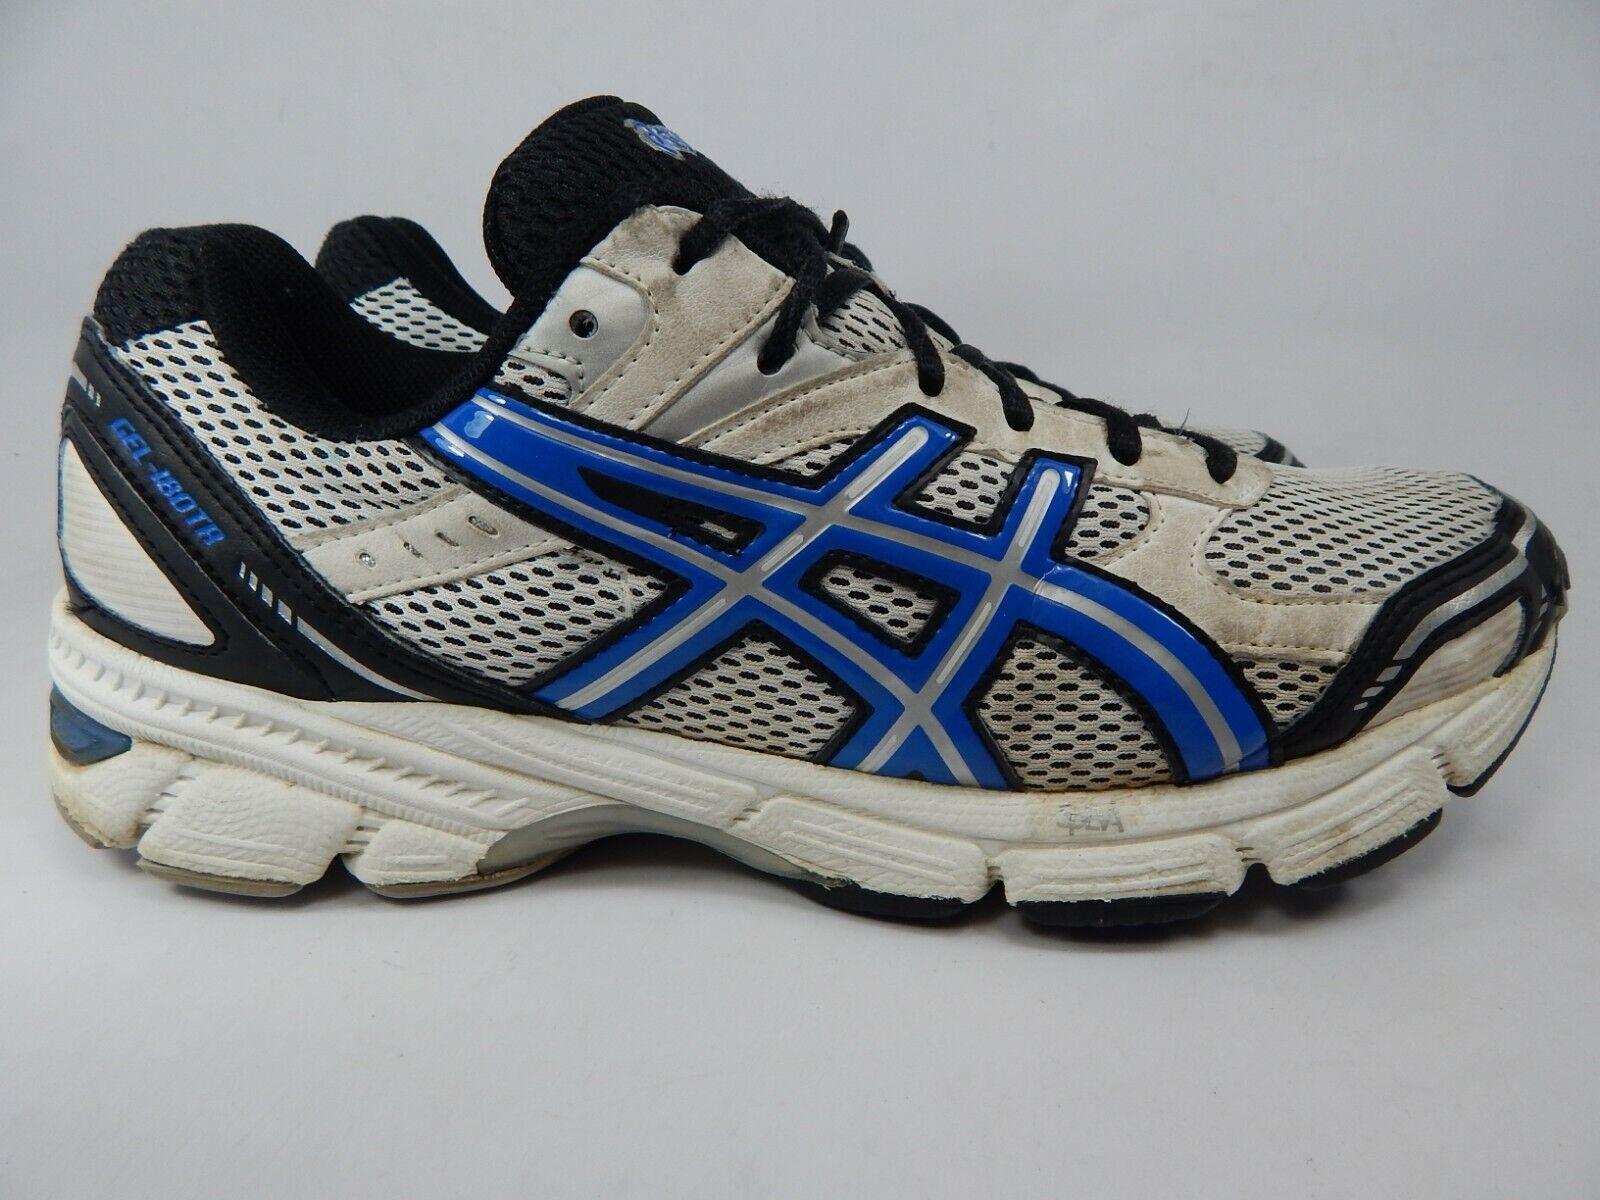 Asics 180 TR Size US 10 M (D) EU 44 Men's Cross Training shoes White bluee S302N